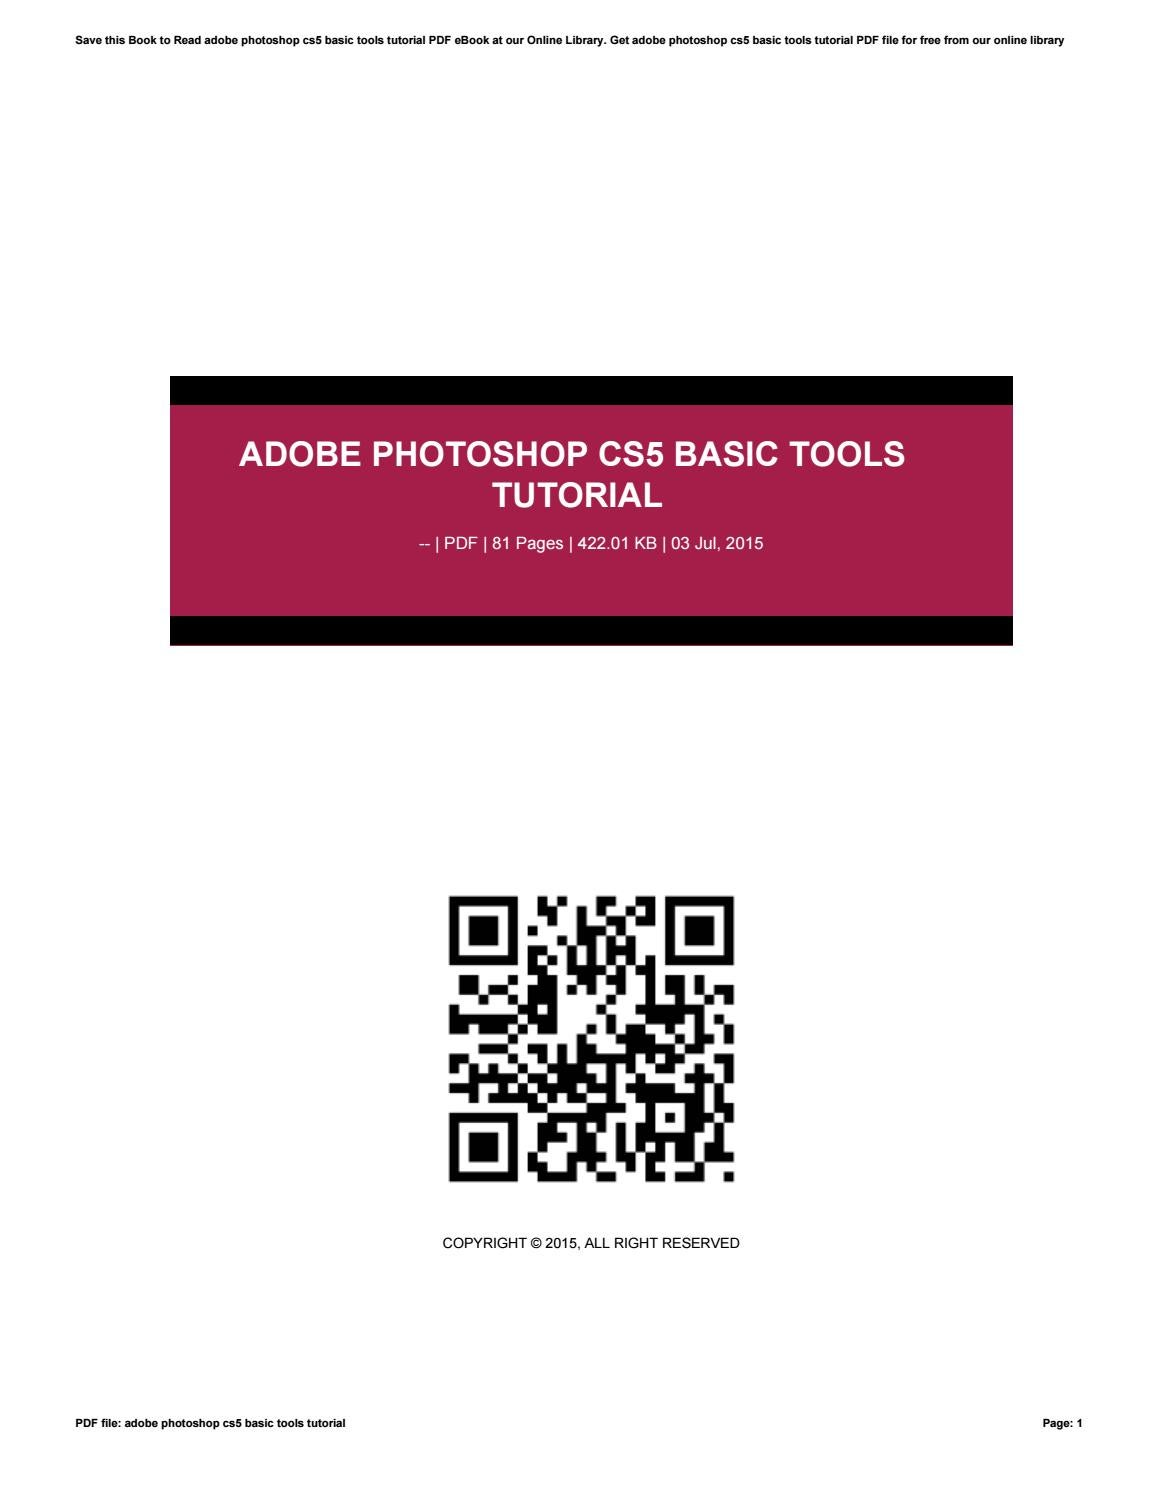 Adobe Photoshop Tutorials Pdf Cs5